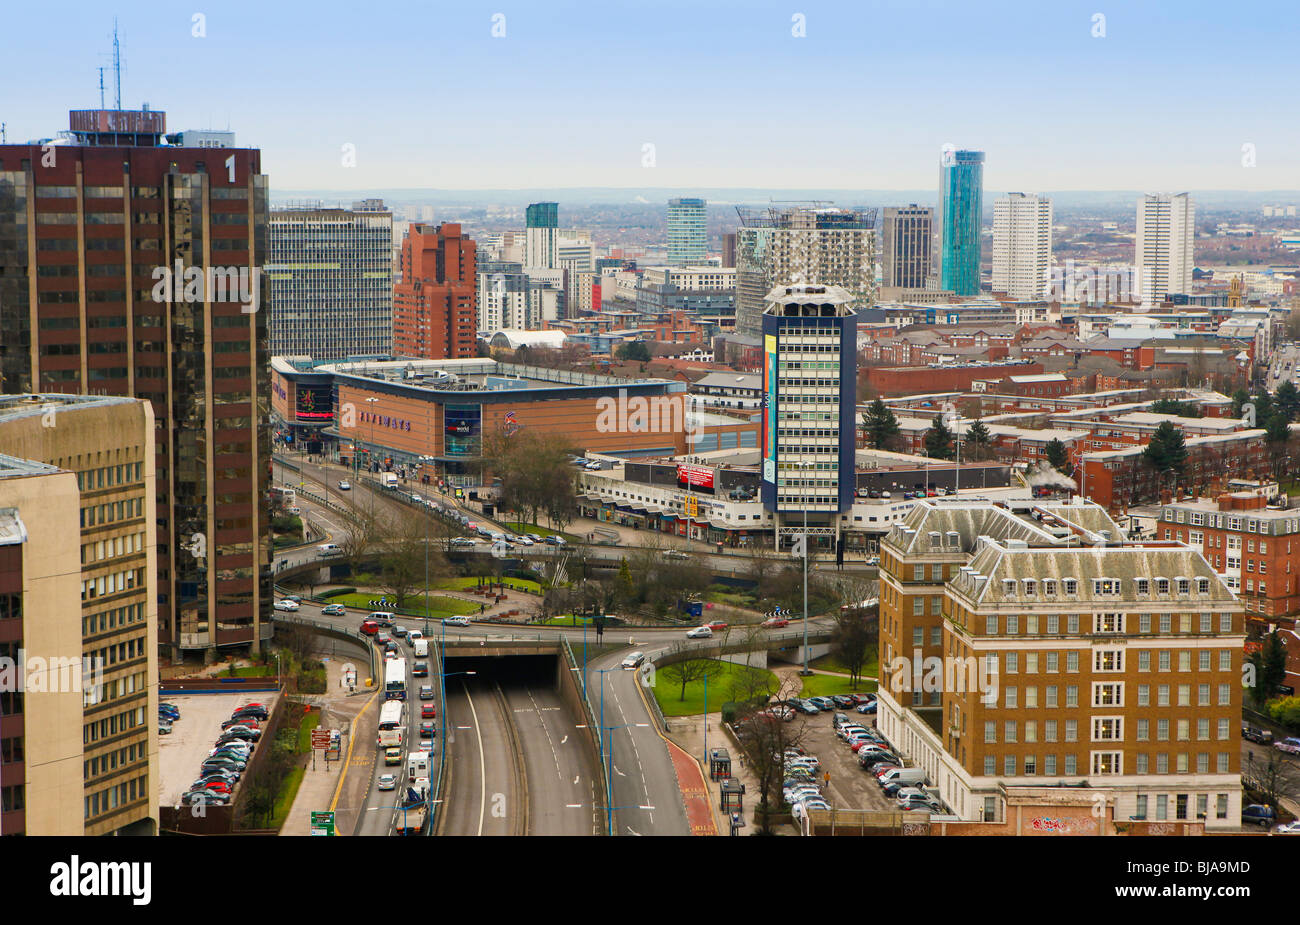 Birmingham City Centre as viewed from Hagley Road in Edgbaston, Birmingham - Stock Image